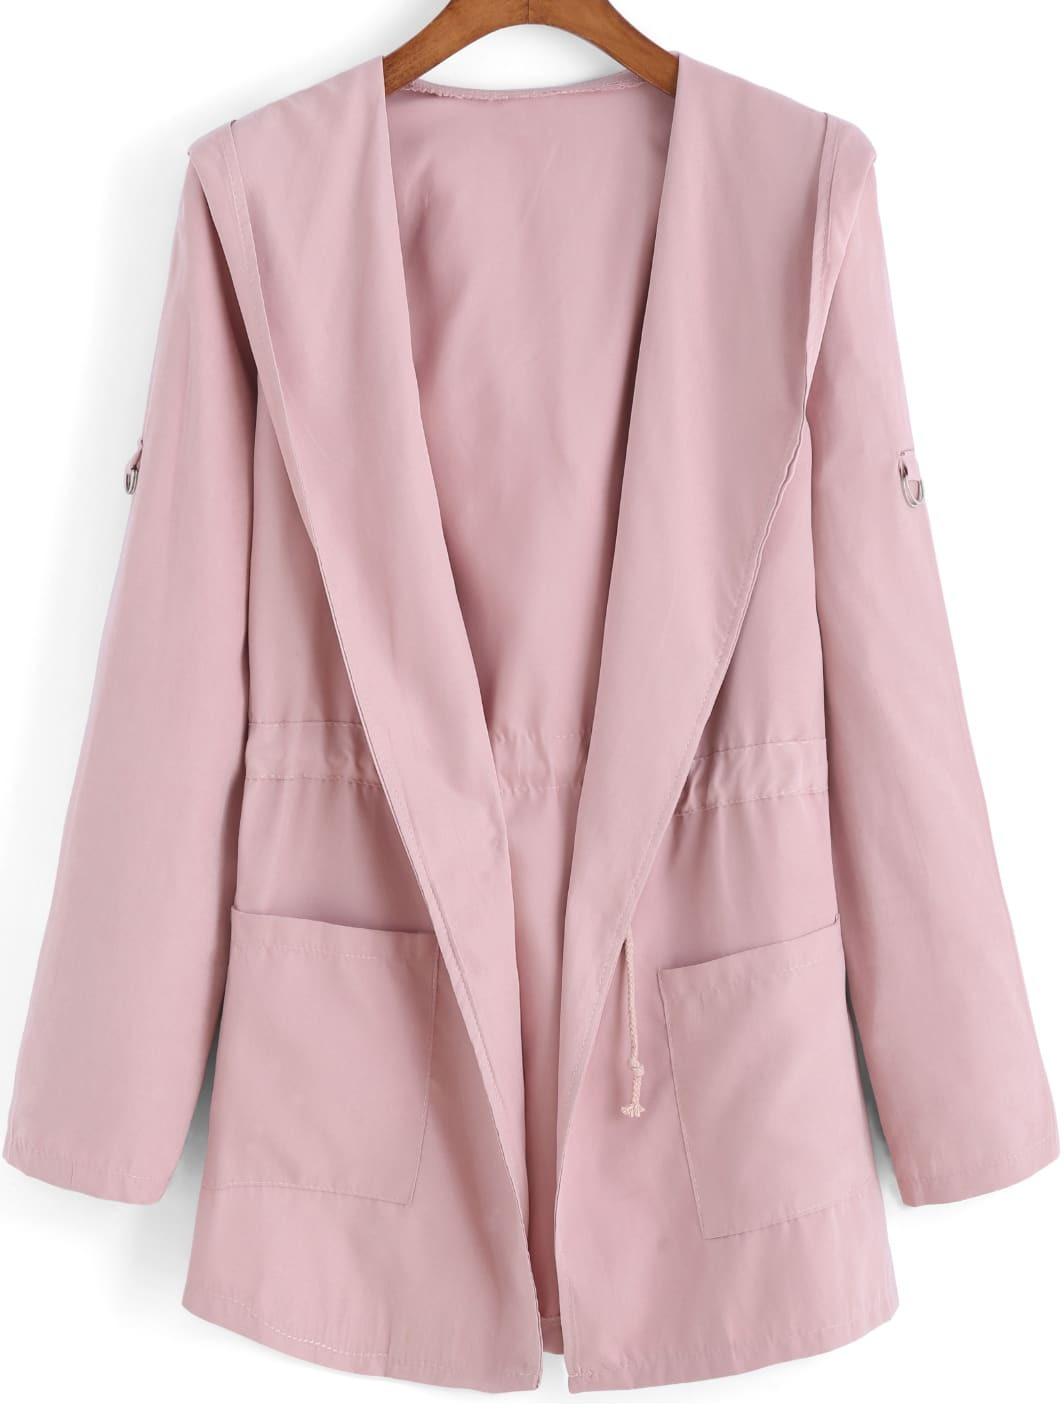 Pink Hooded Long Sleeve Drawstring Pockets Coat